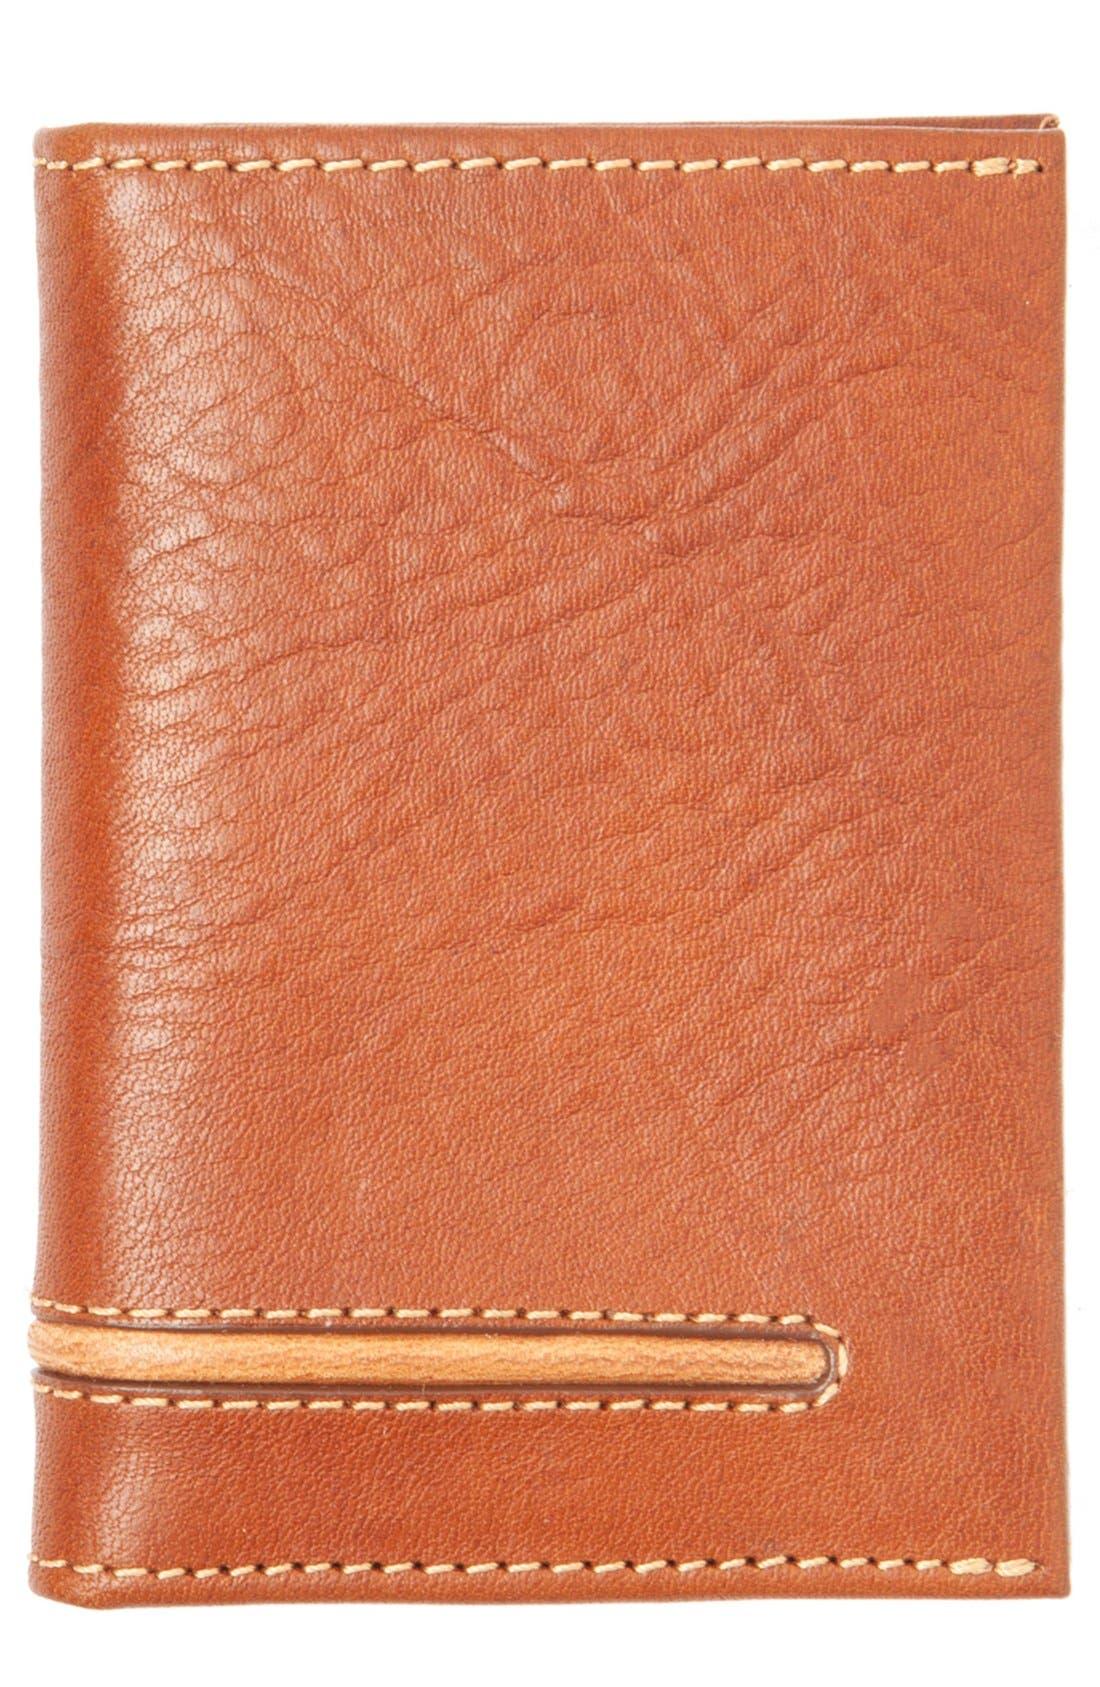 Leather Money Clip Card Case,                             Main thumbnail 1, color,                             200